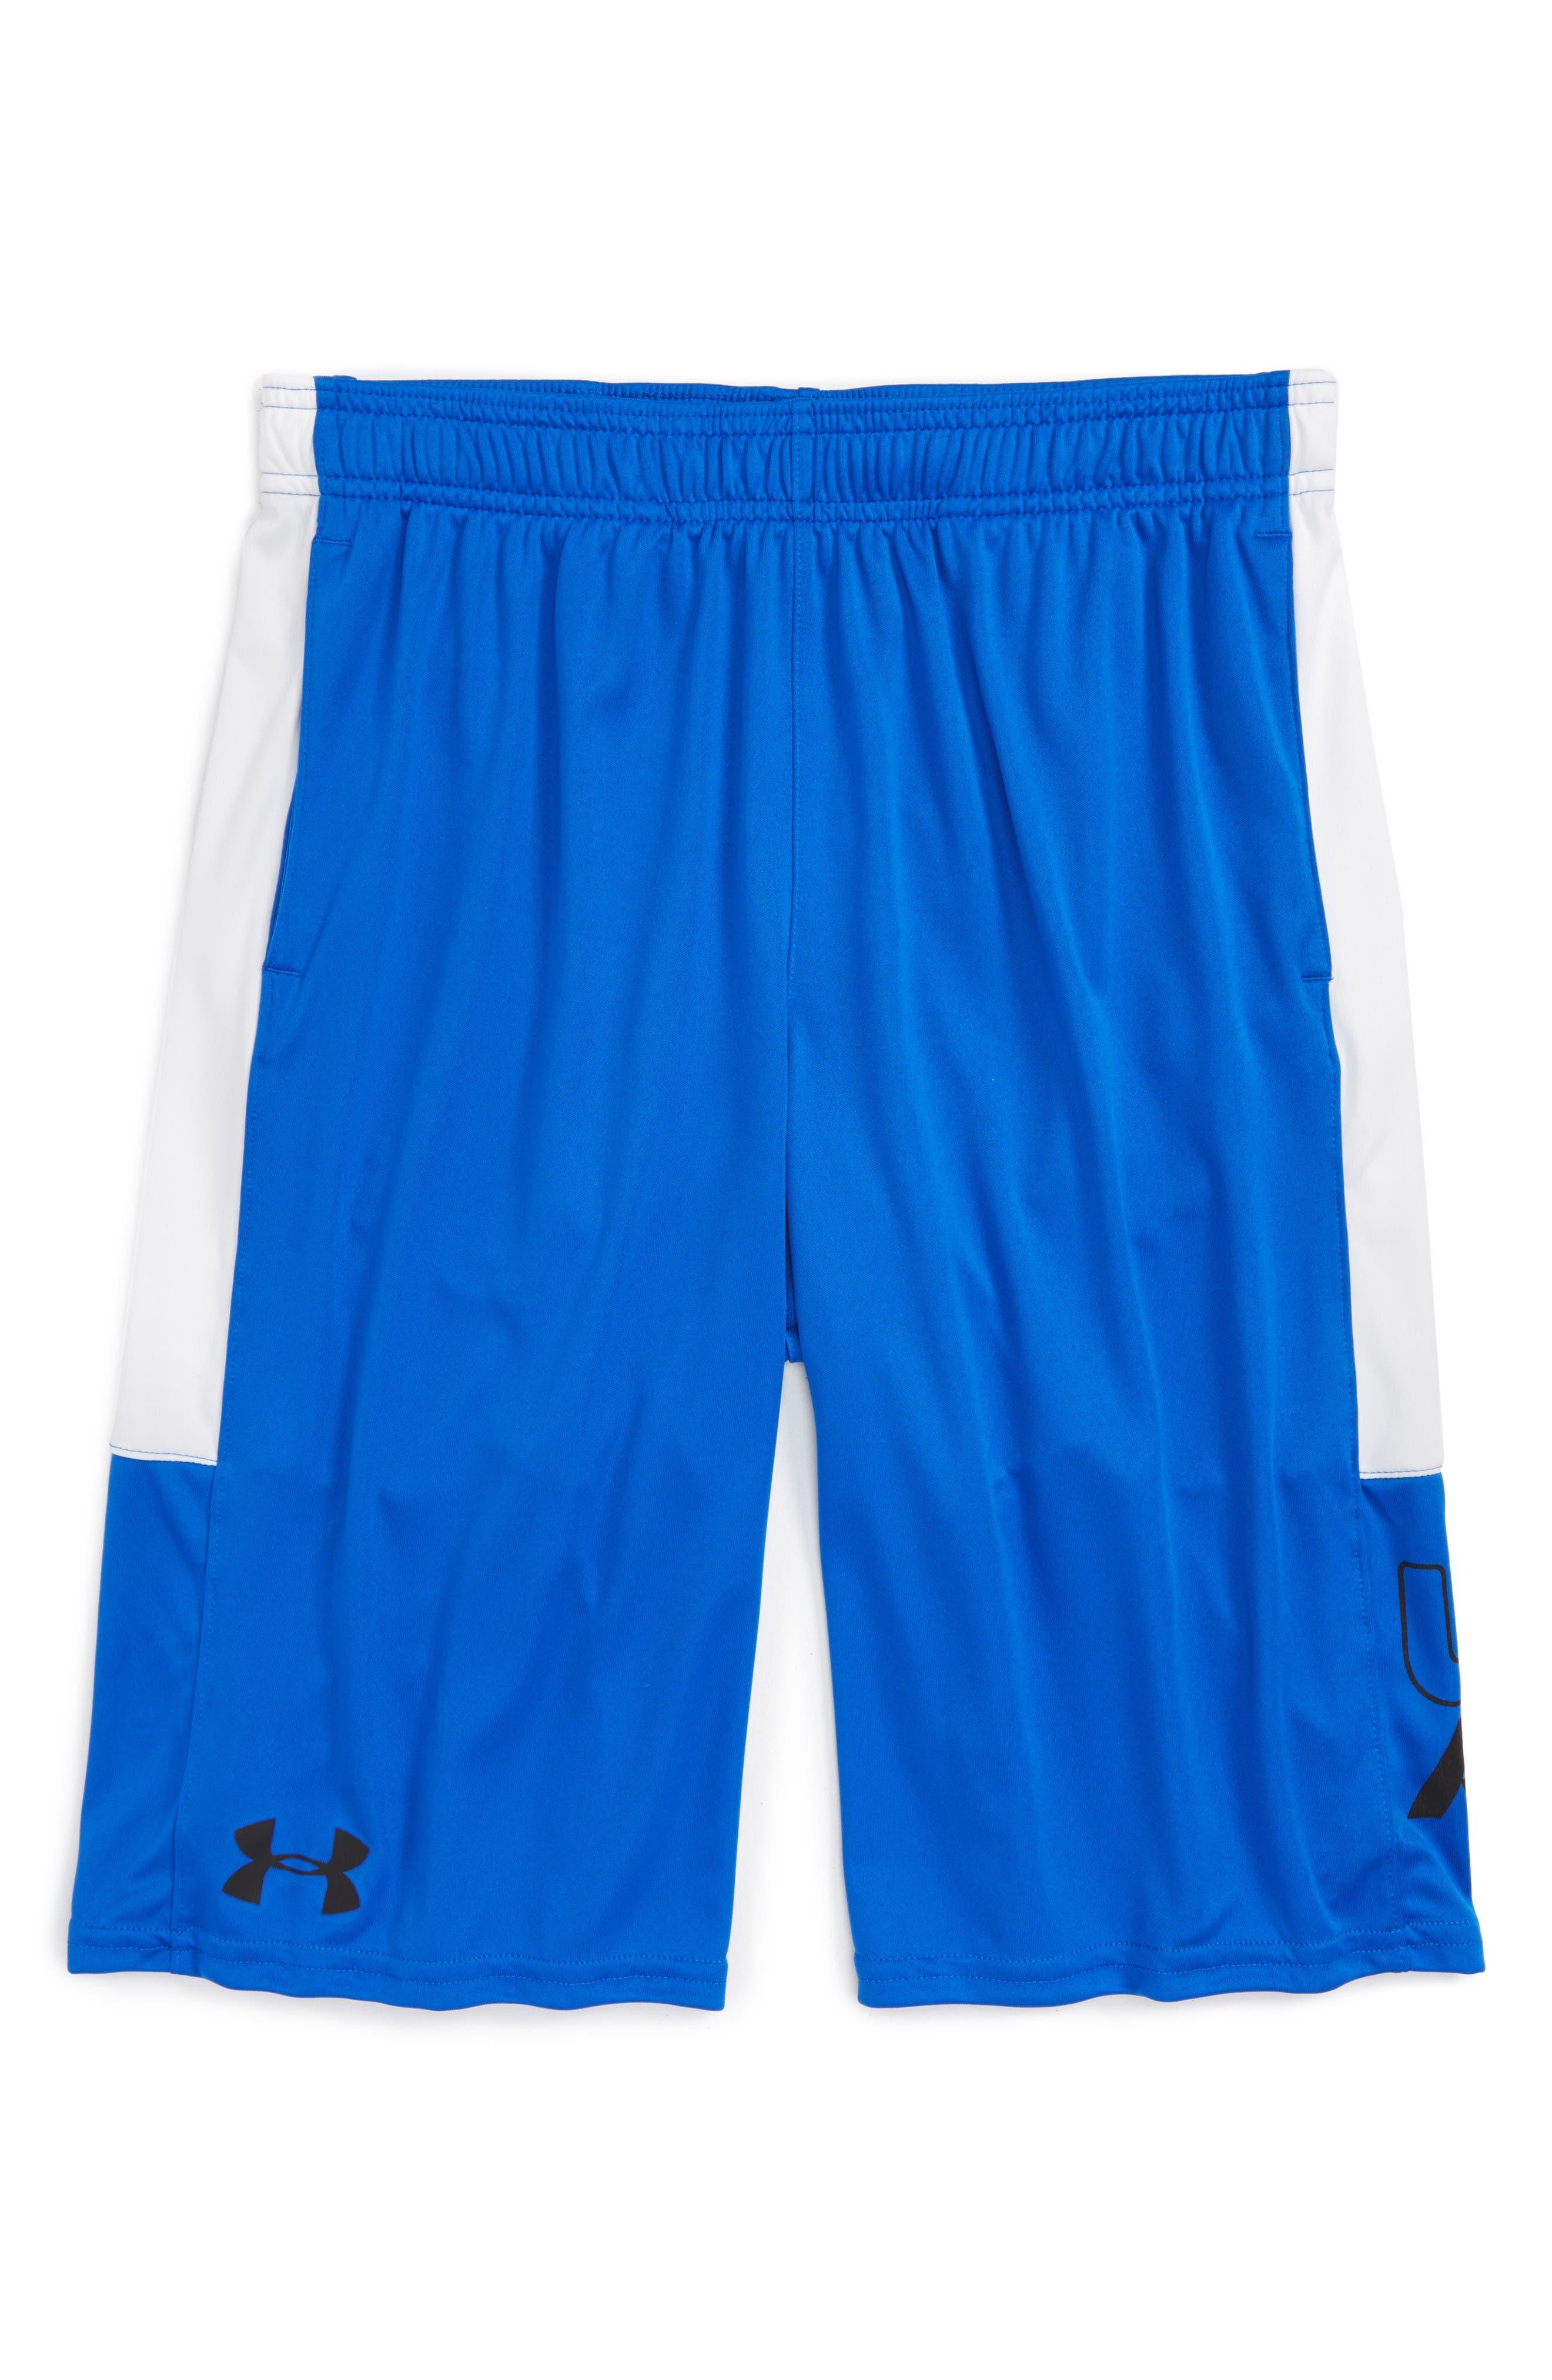 Stunt HeatGear<sup>®</sup> Shorts,                         Main,                         color, Ultra Blue/ White/ Black